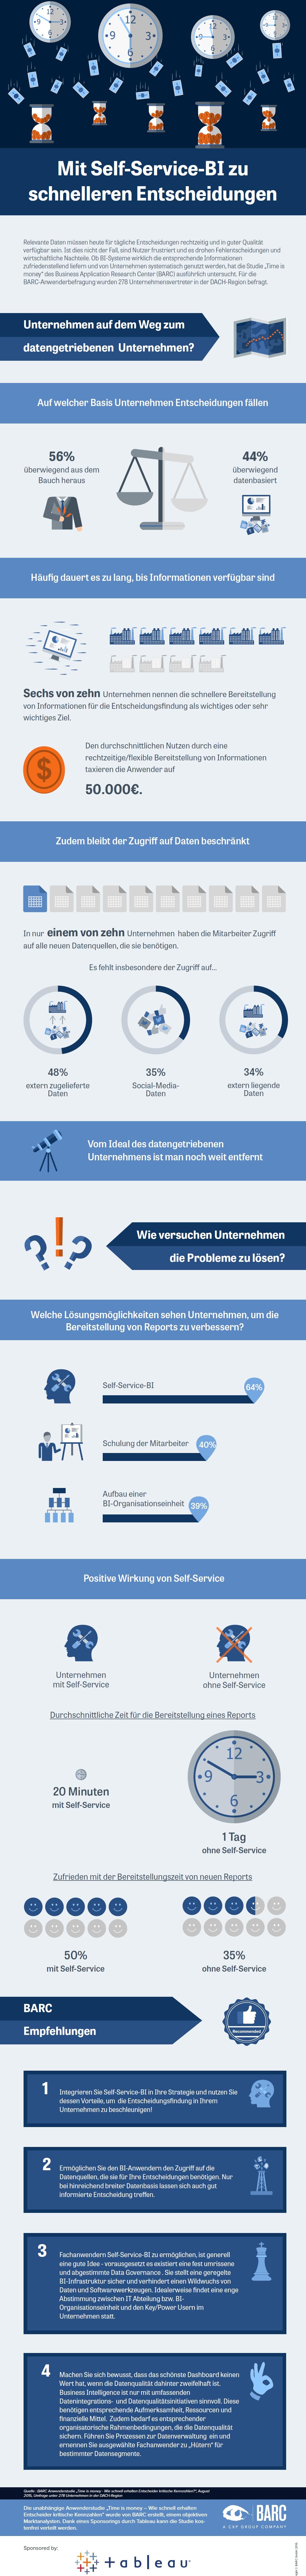 infografik barc self-service-bi